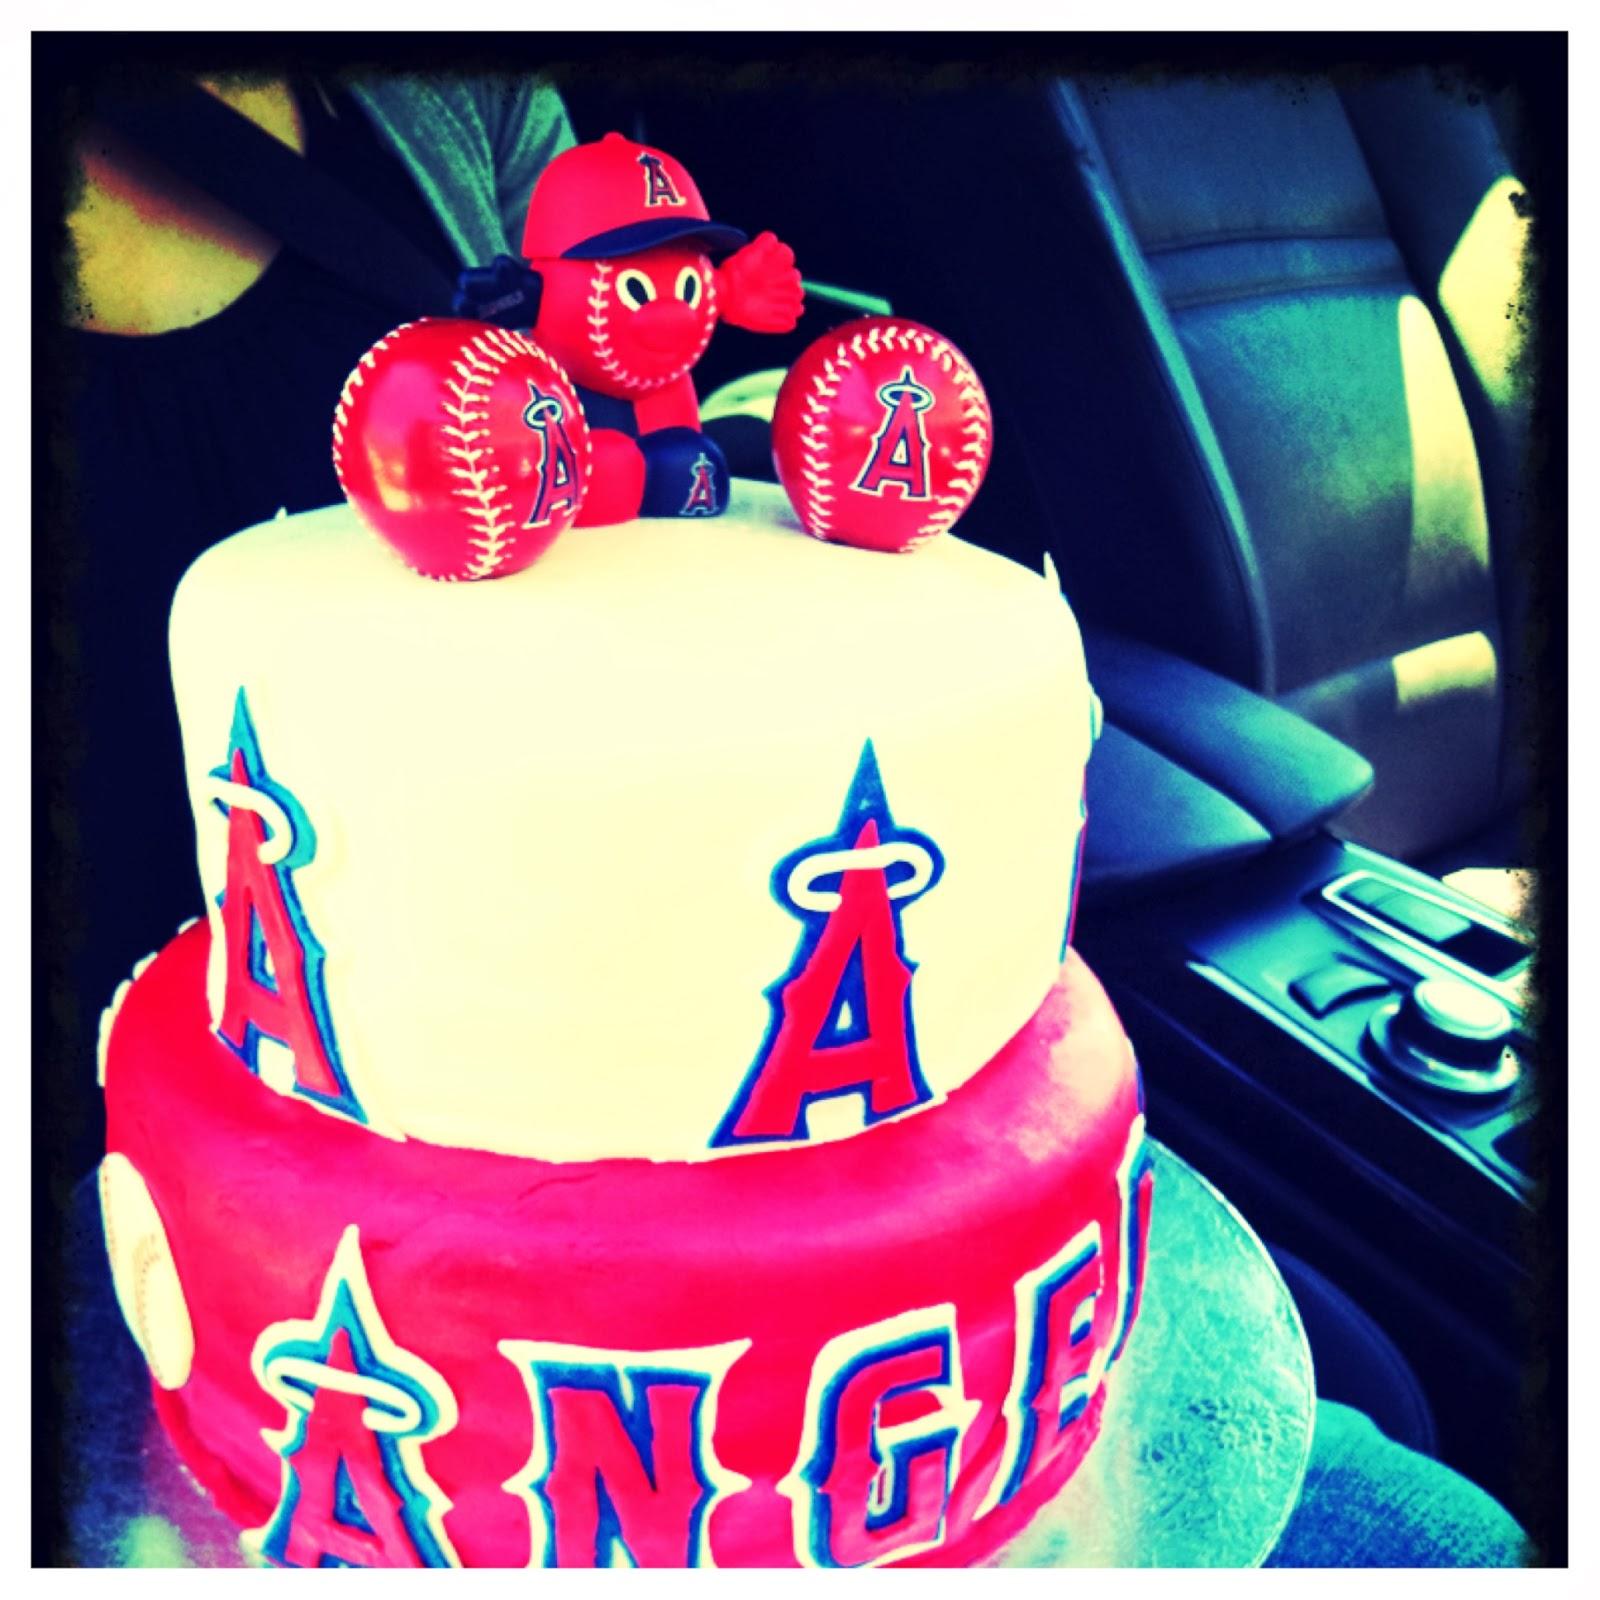 Crispys Cakes angels baseball cake